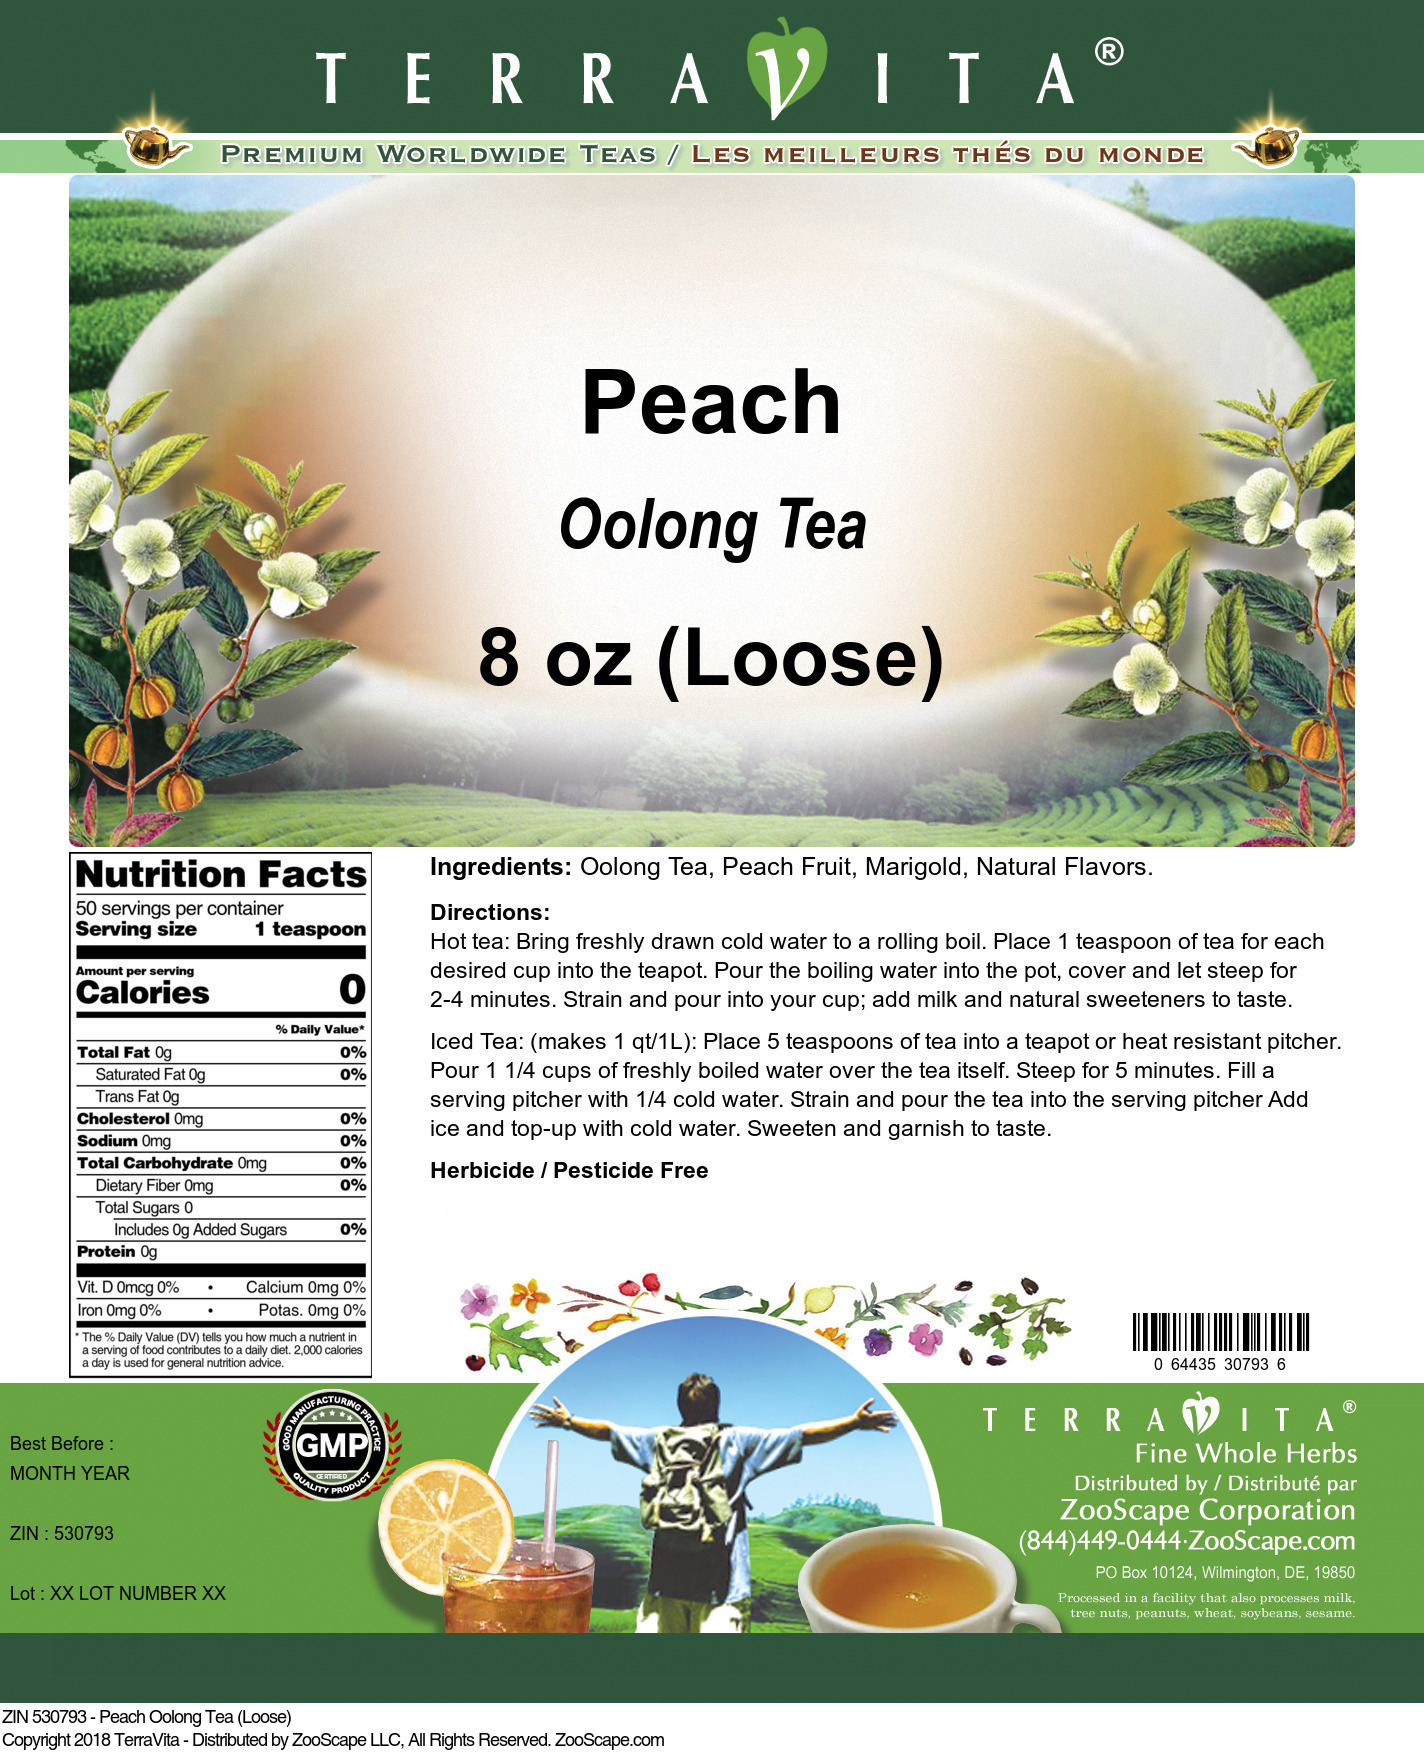 Peach Oolong Tea (Loose)